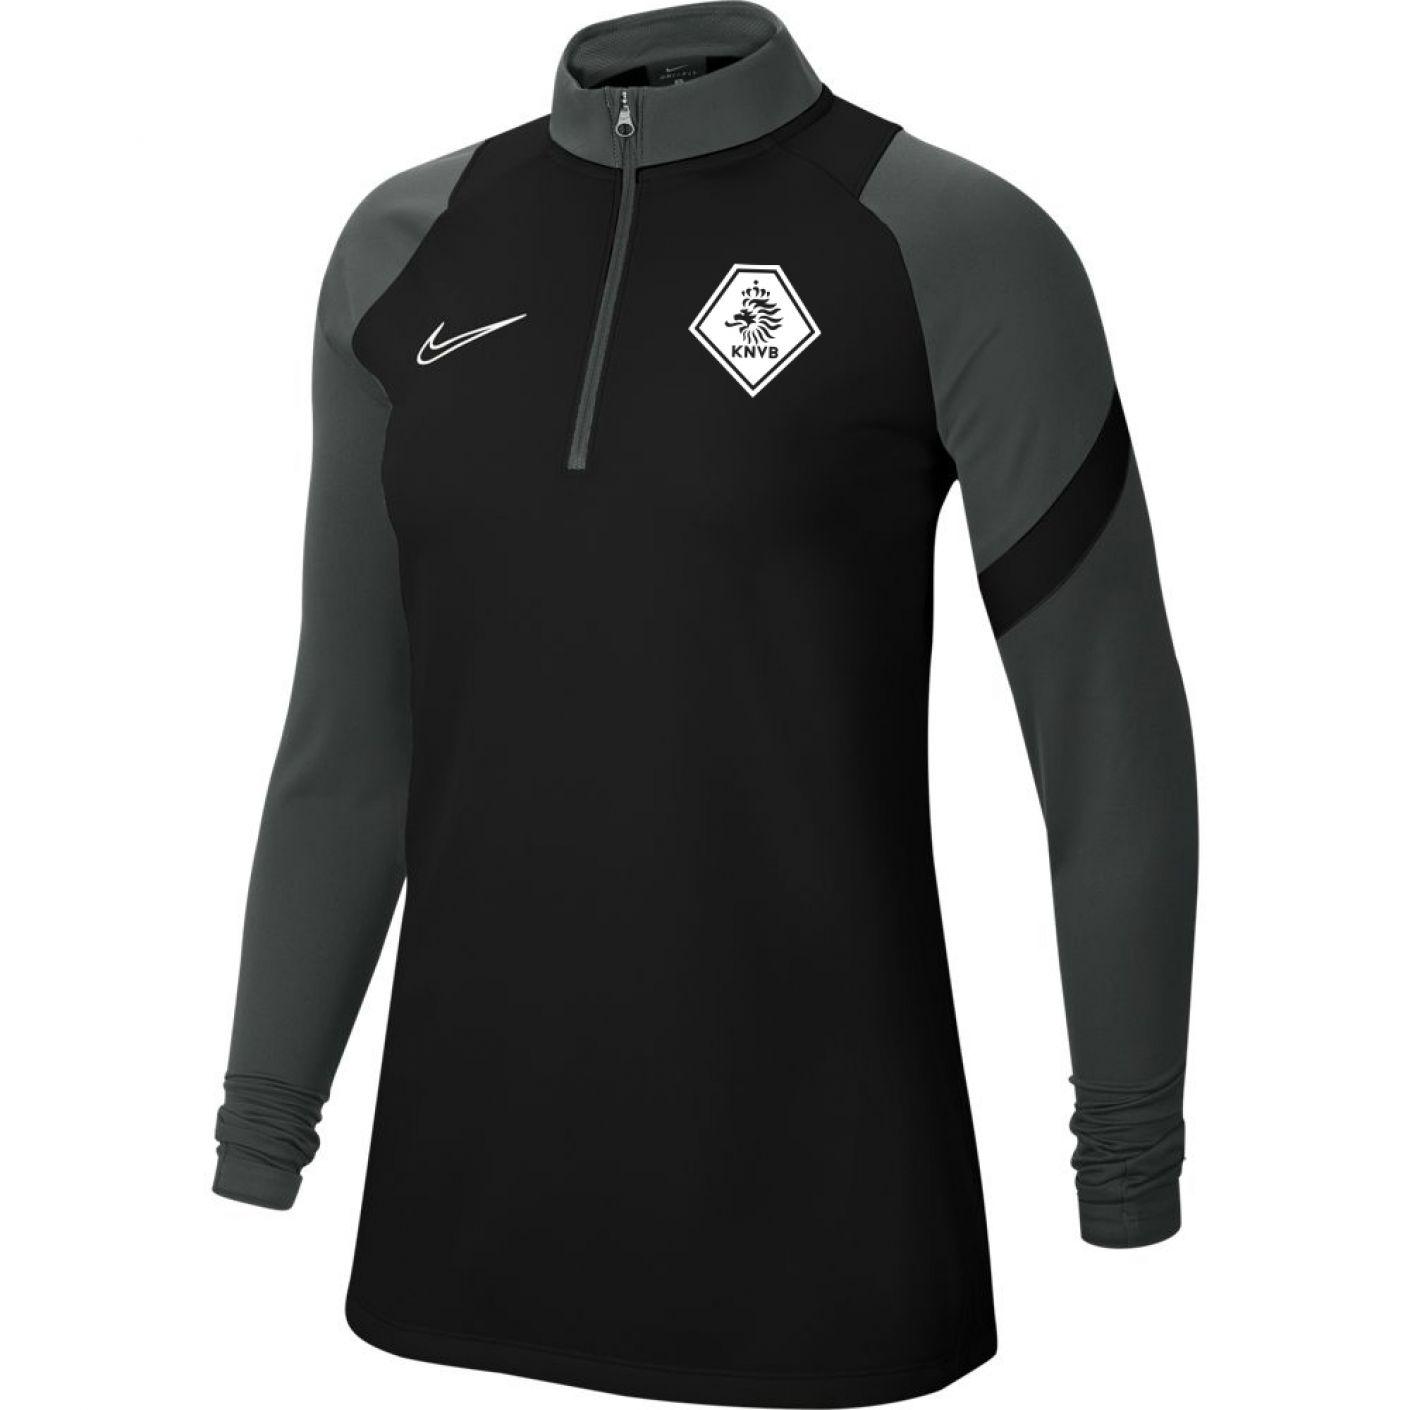 Nike KNVB Academy Pro Trainingstrui Vrouwen Zwart Antraciet